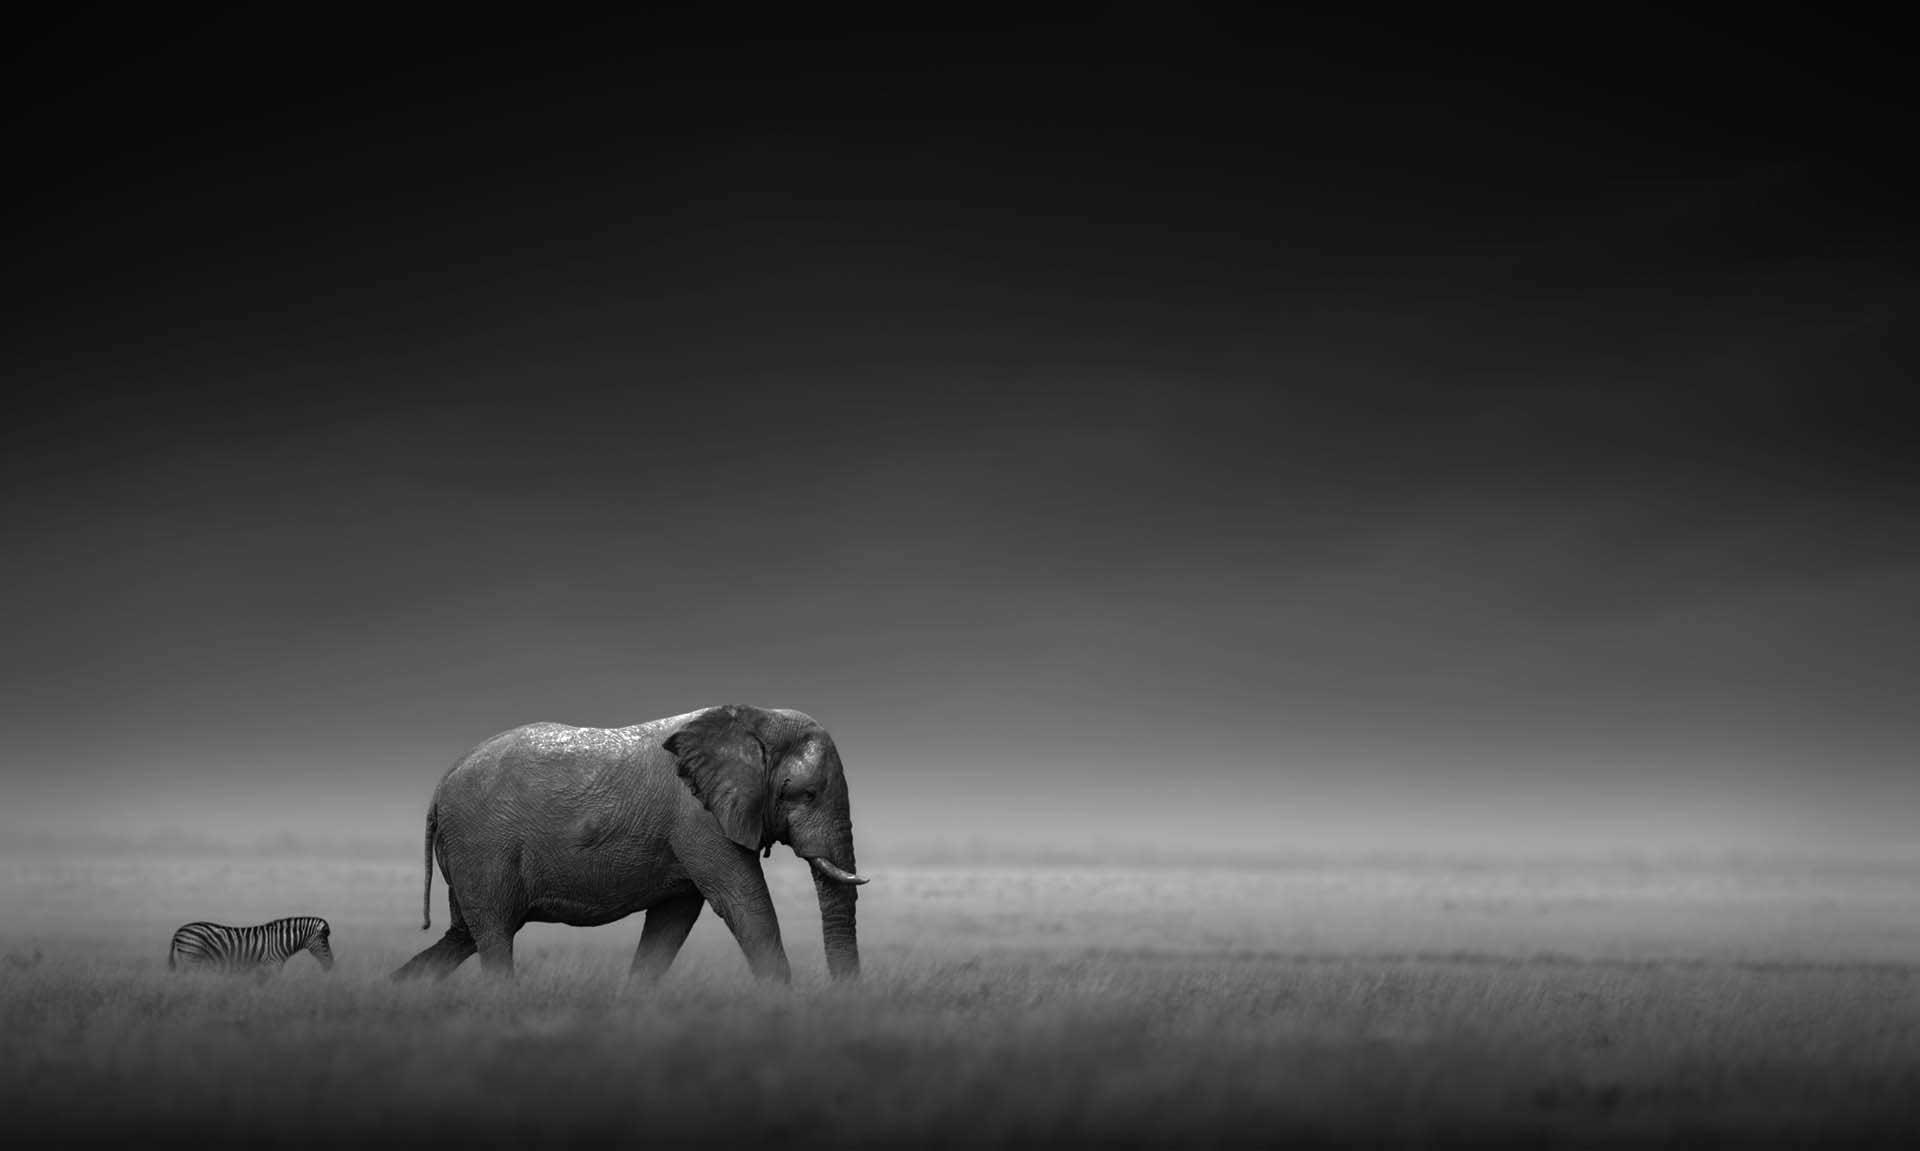 elephant-zebra.jpg